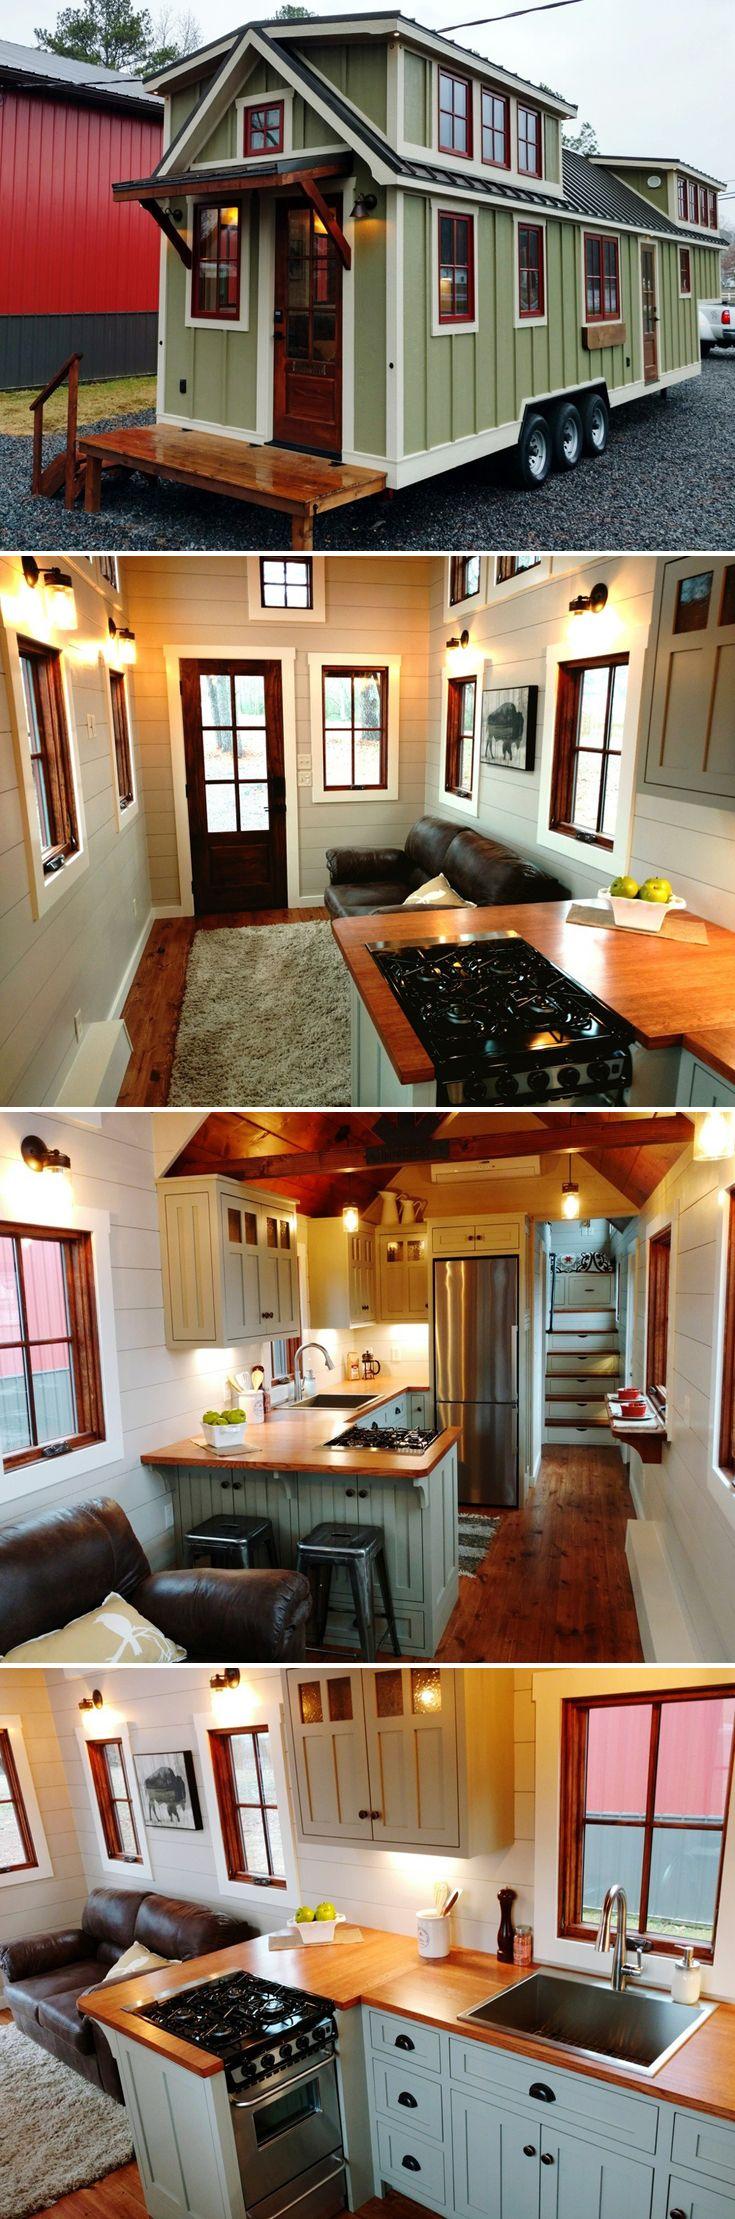 denali by timbercraft tiny homes tiny house - Tiny House Appliances